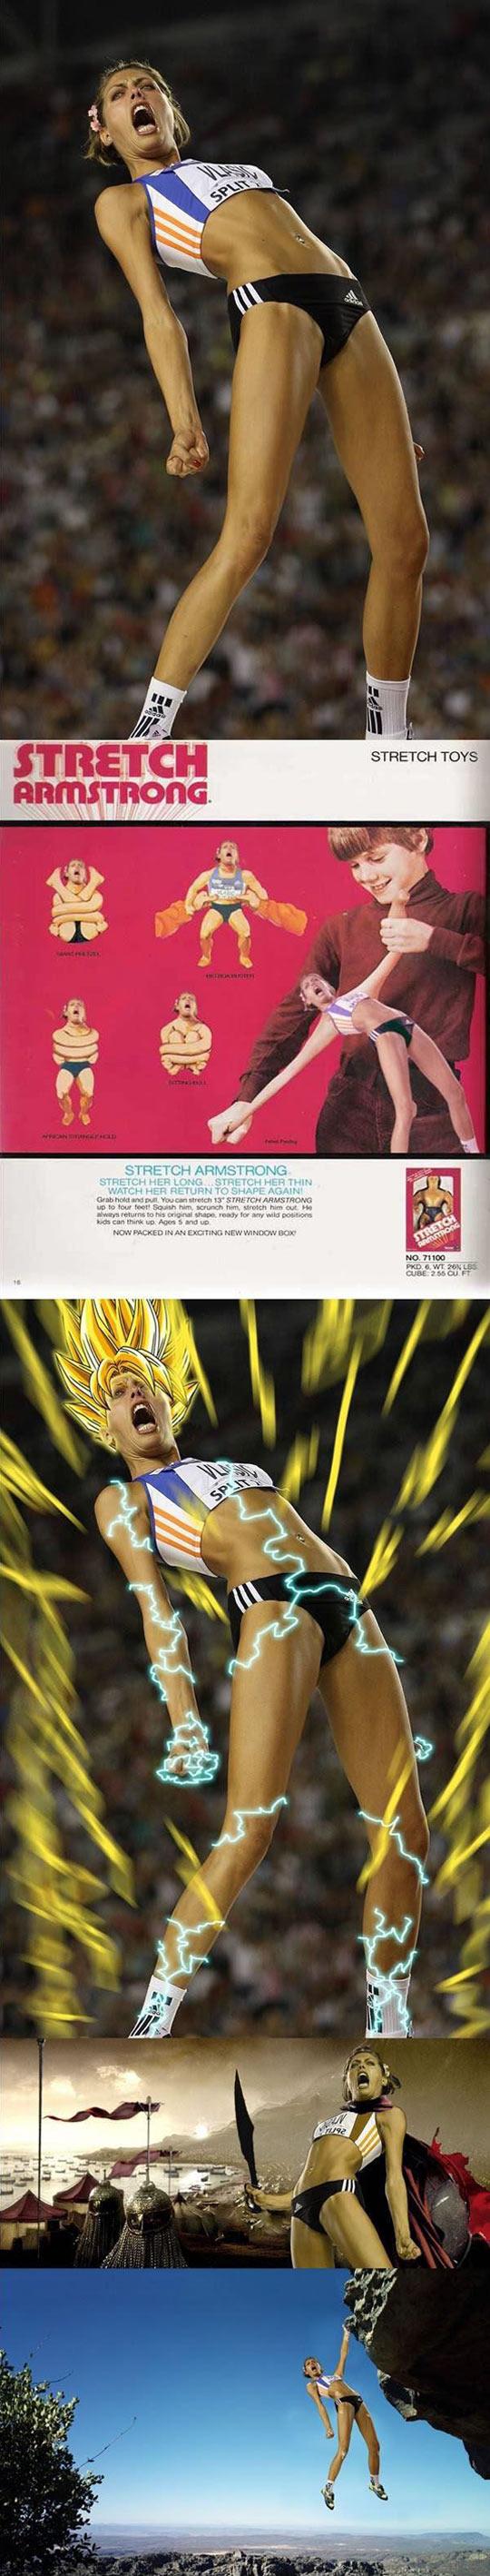 funny-girl-gym-Photoshop-battle